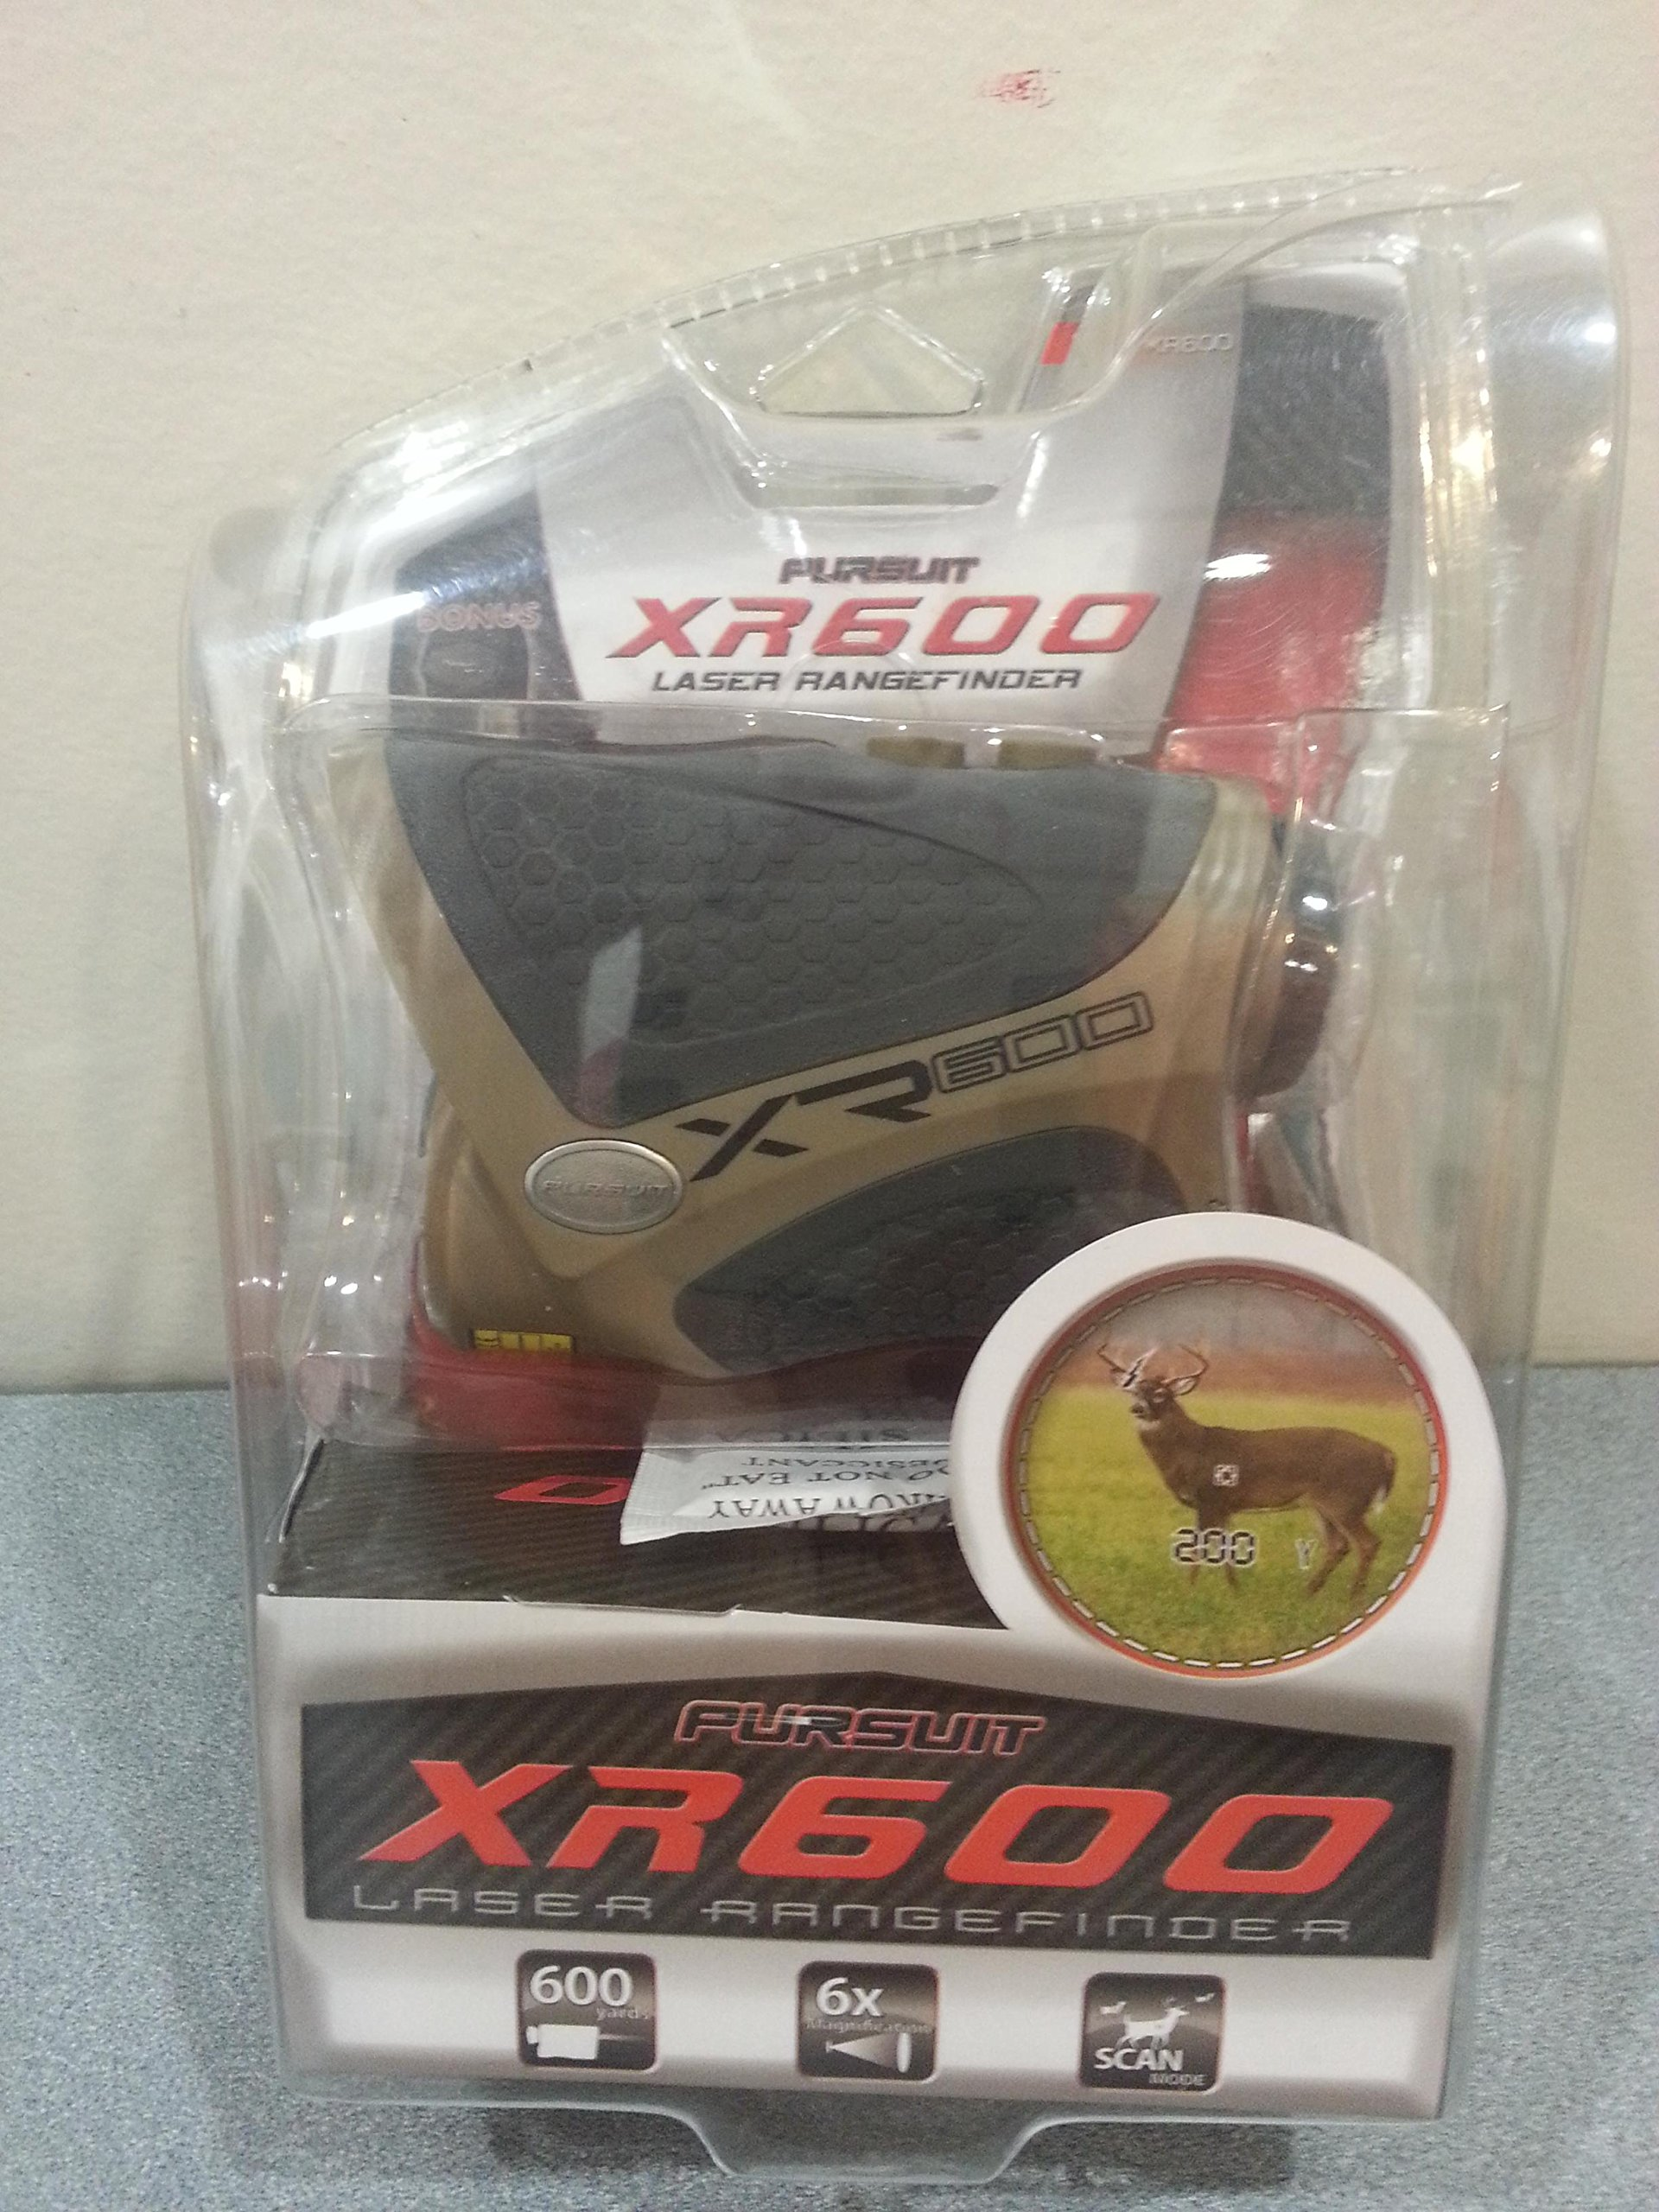 Pursuit Laser Range Finder XR600 Hunting Golf 600 Yard Magnification by Pursuit